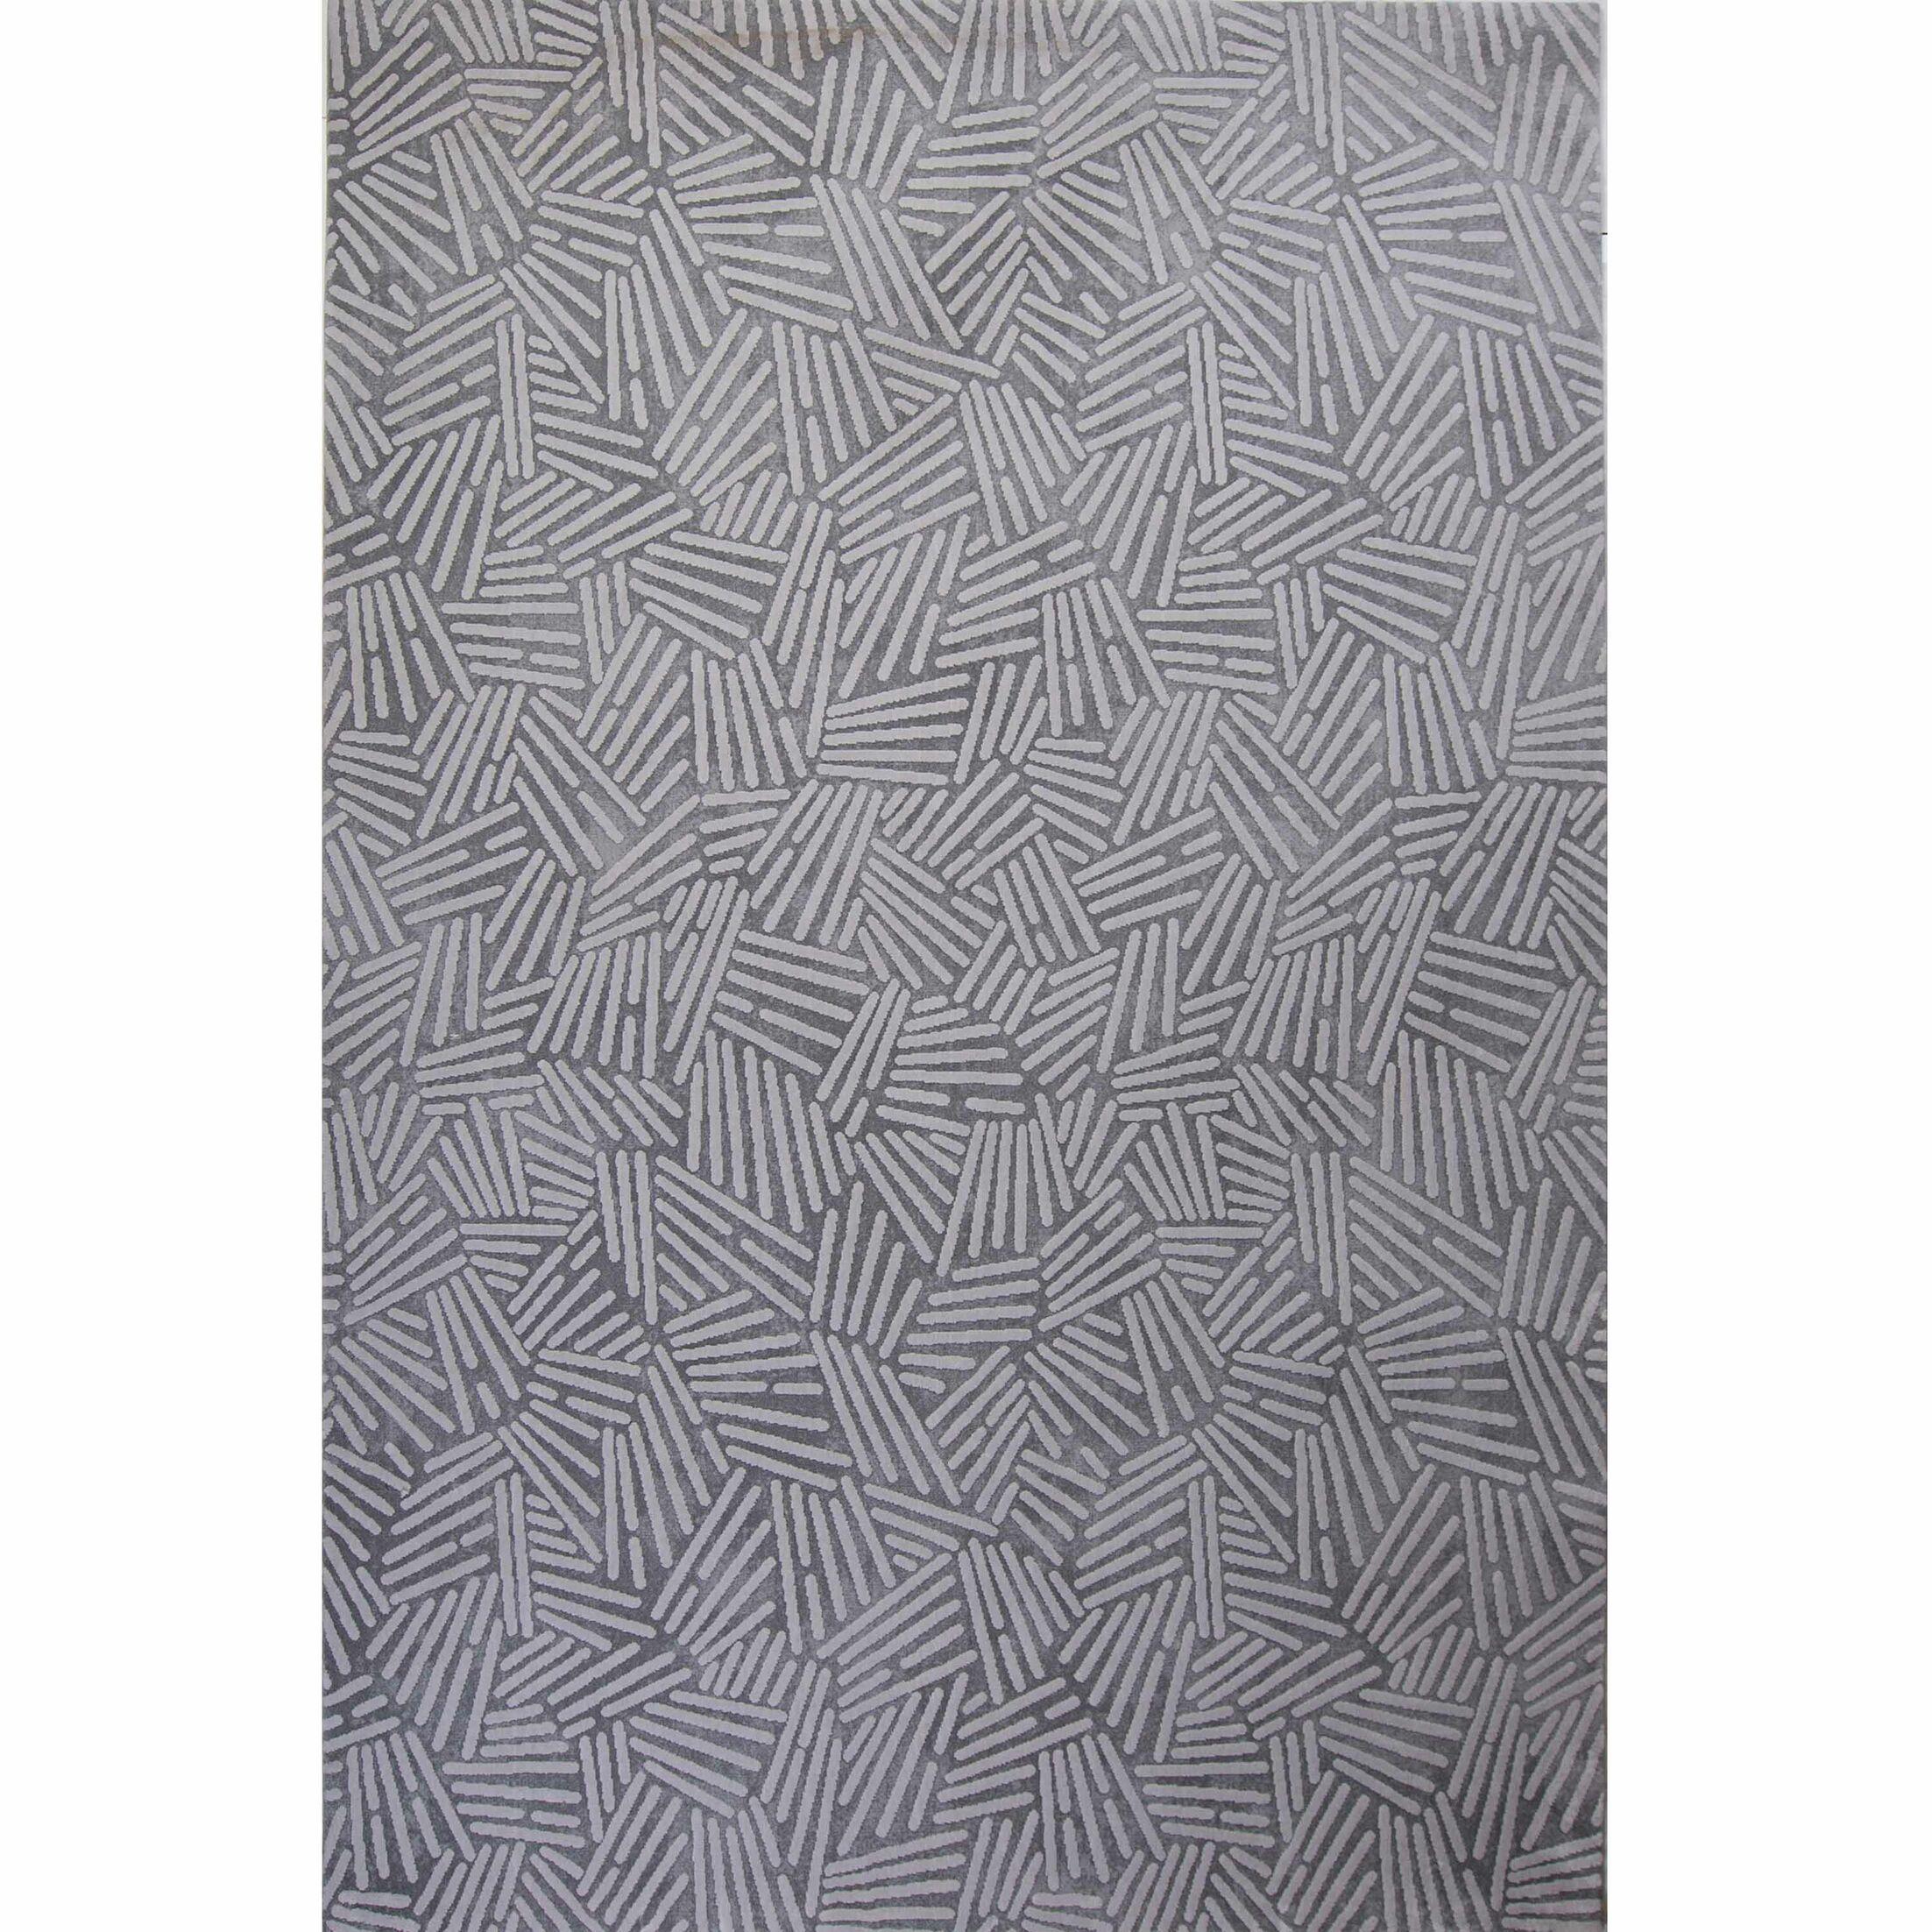 Vytla Gray Area Rug Rug Size: 5'2